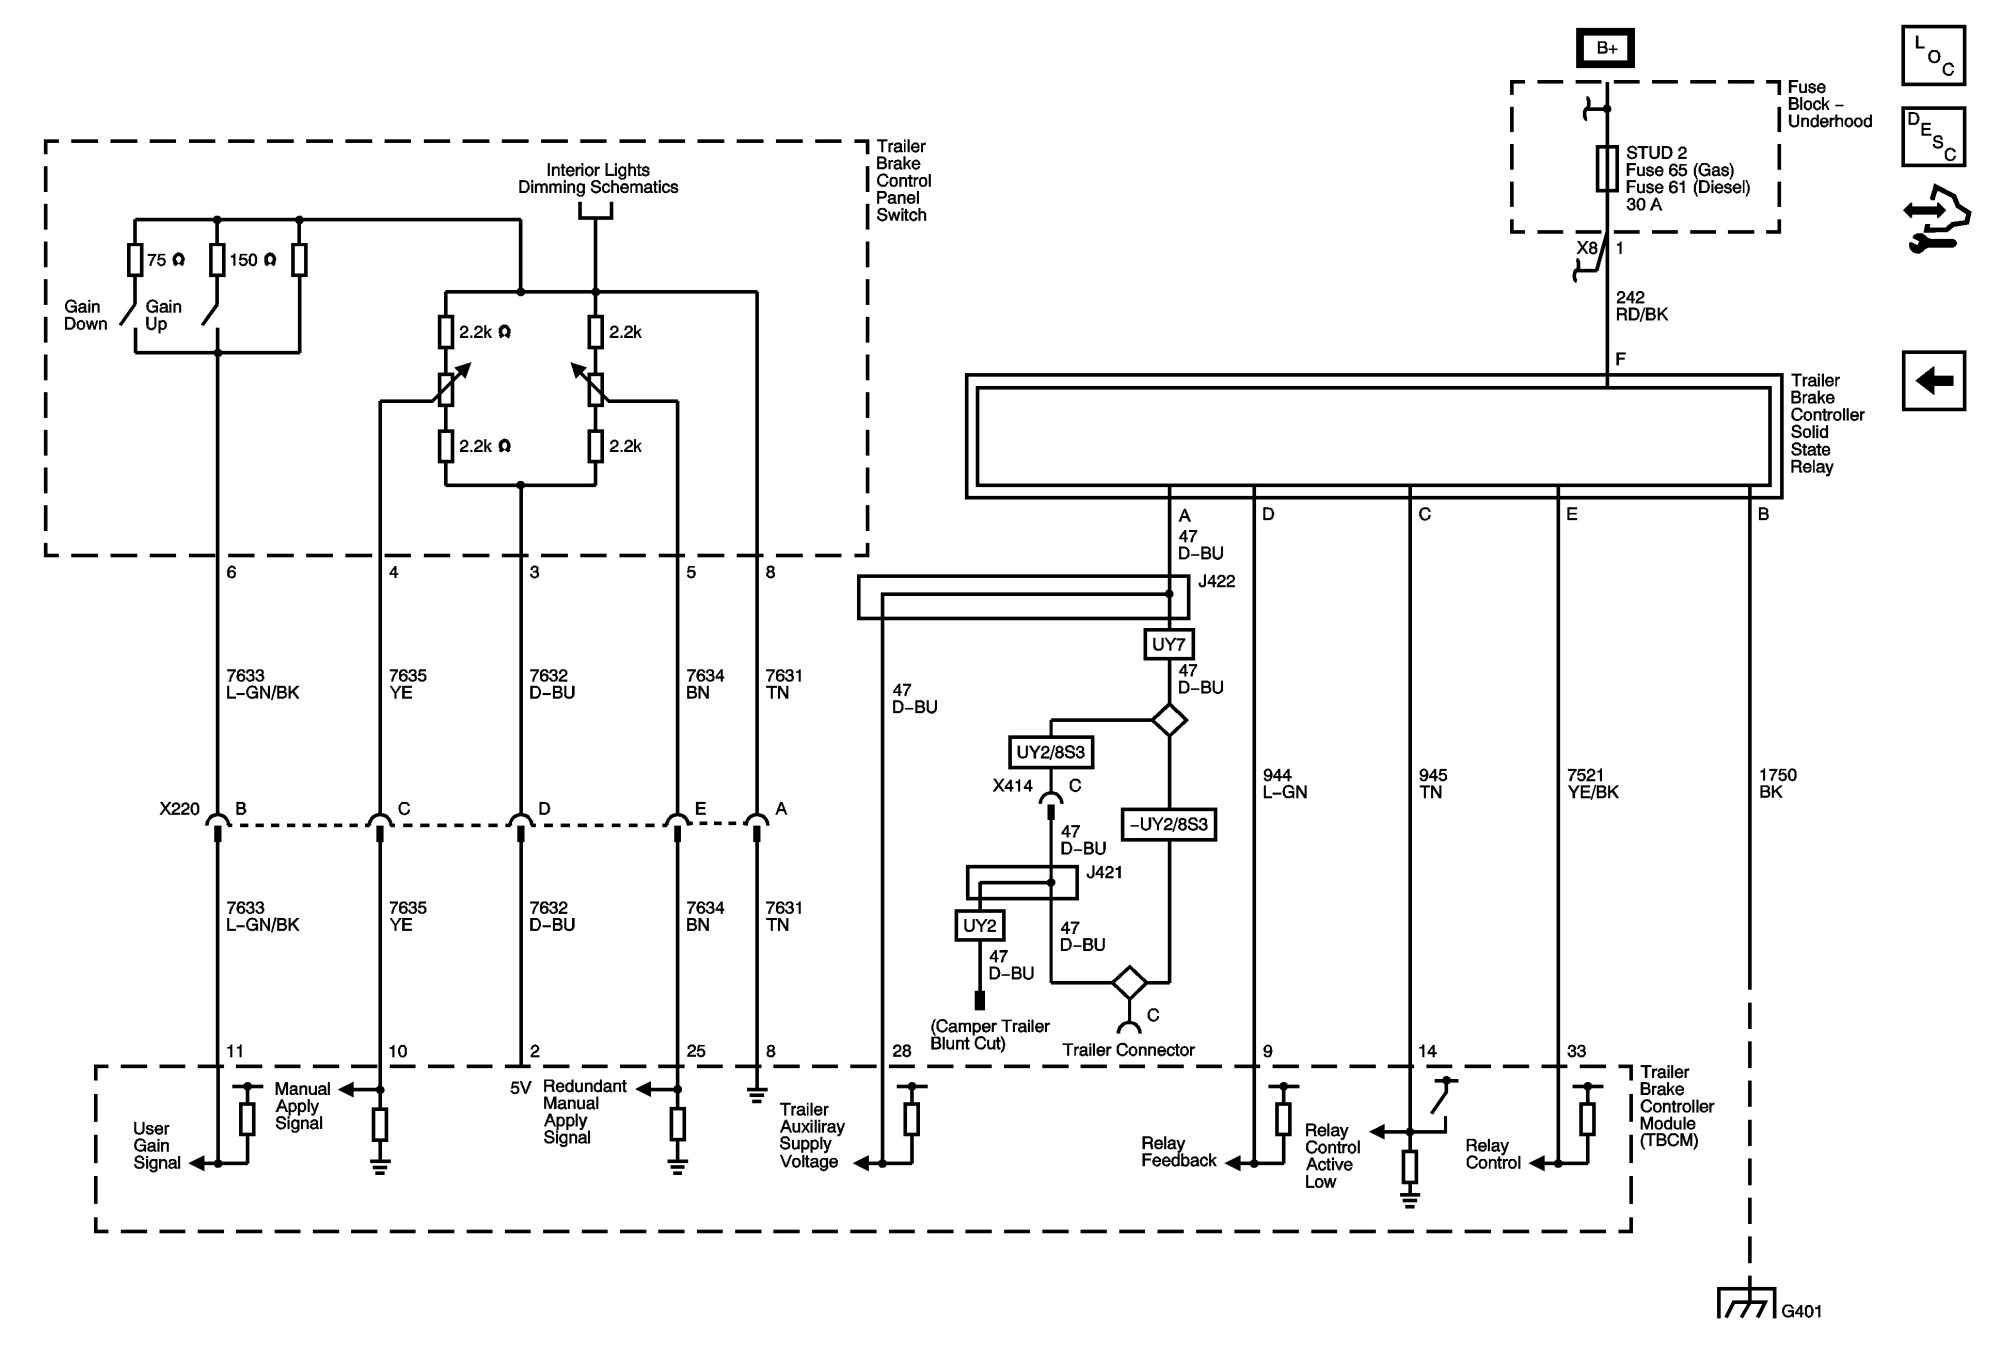 hight resolution of 4 prong twist lock plug wiring diagram collection 4 prong twist lock plug wiring diagram